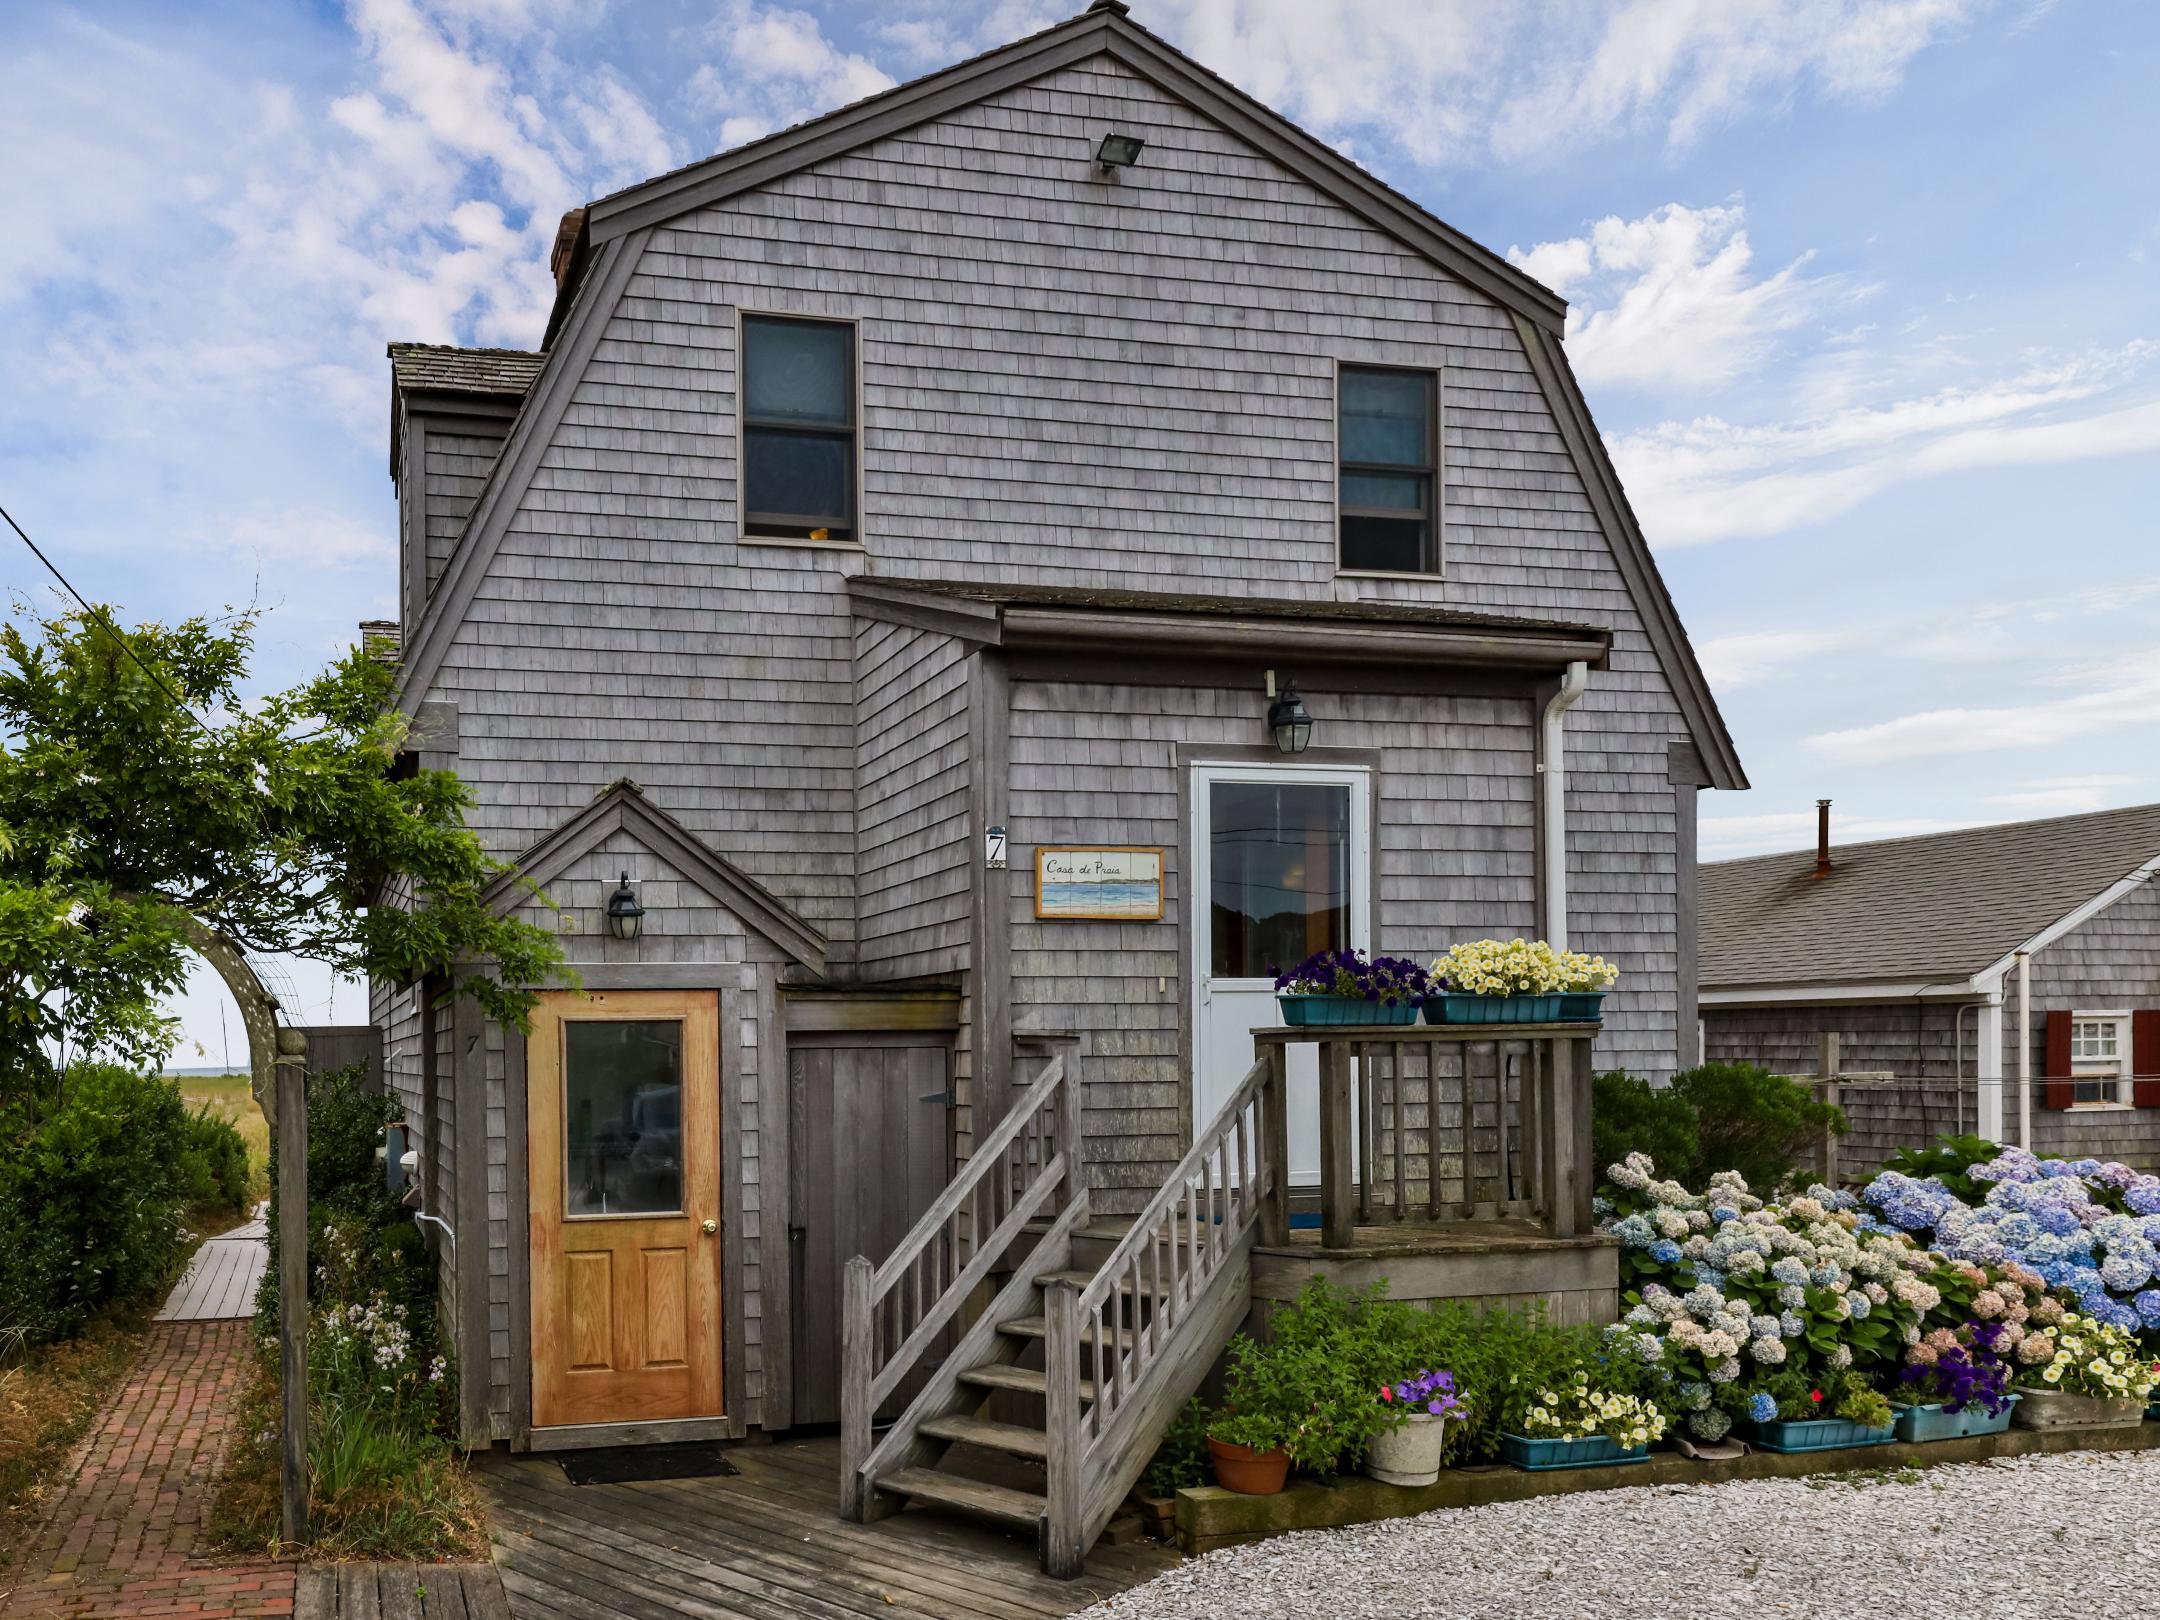 7 Garfield Street, Provincetown MA, 02657 details